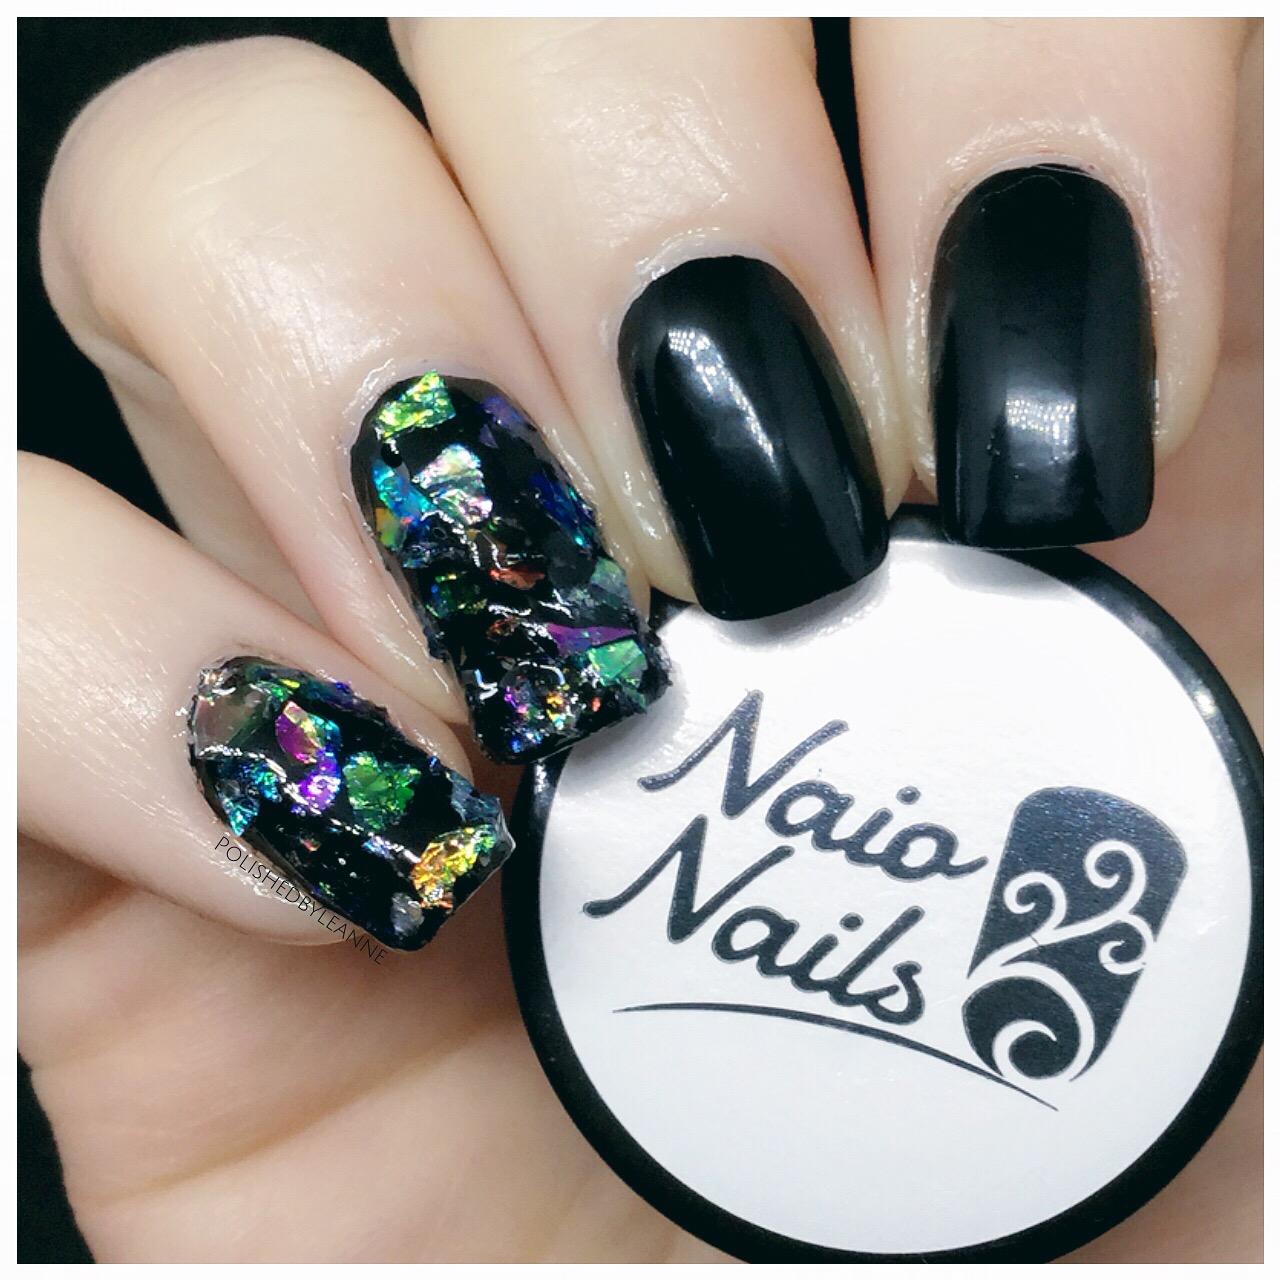 Naio nails - cracked ice nails